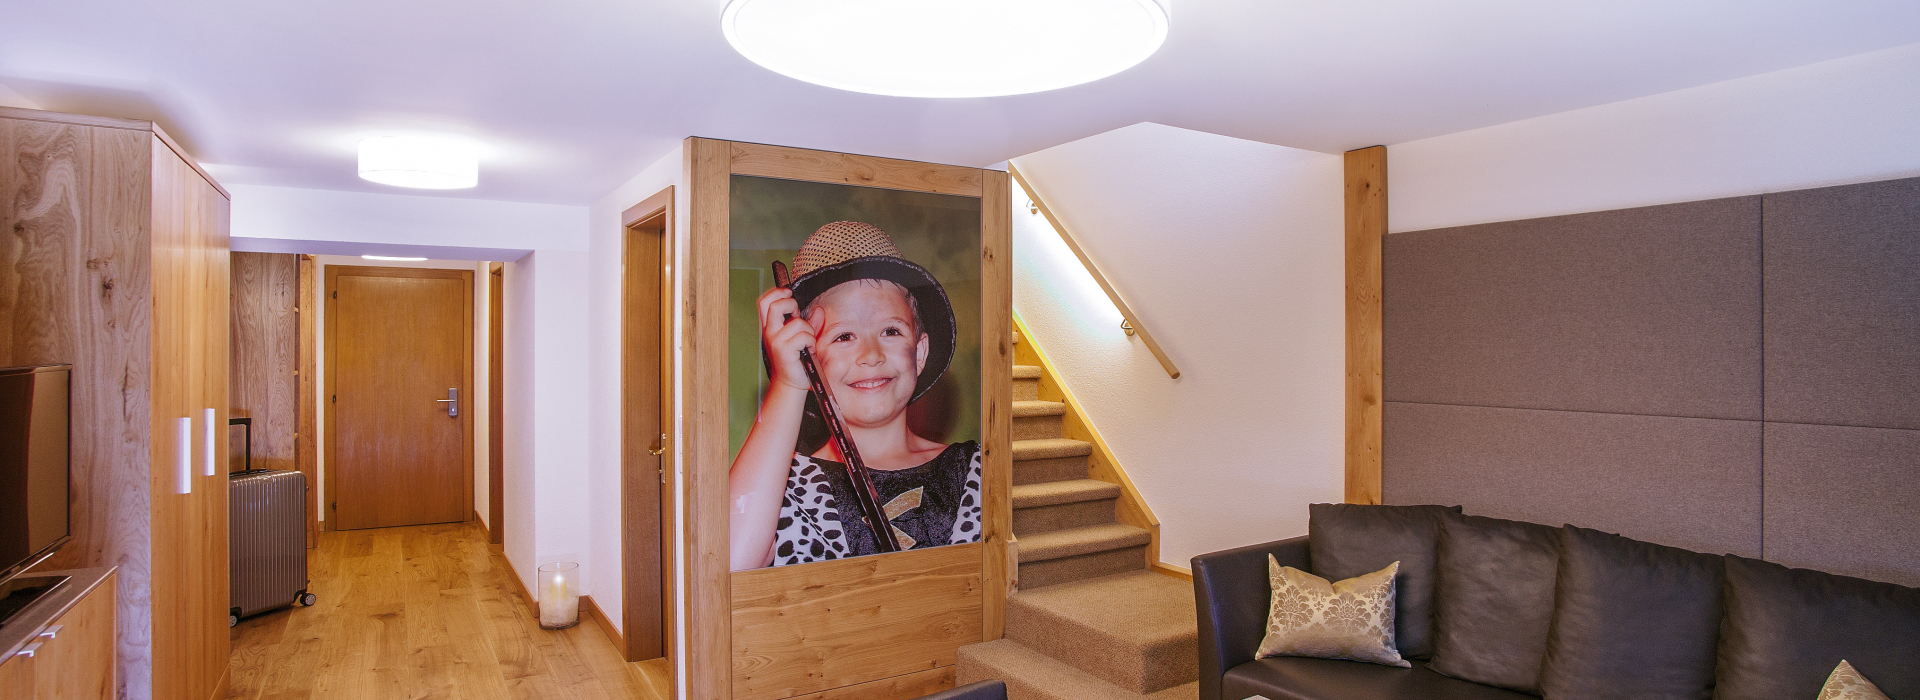 Hotel Löwe 4*